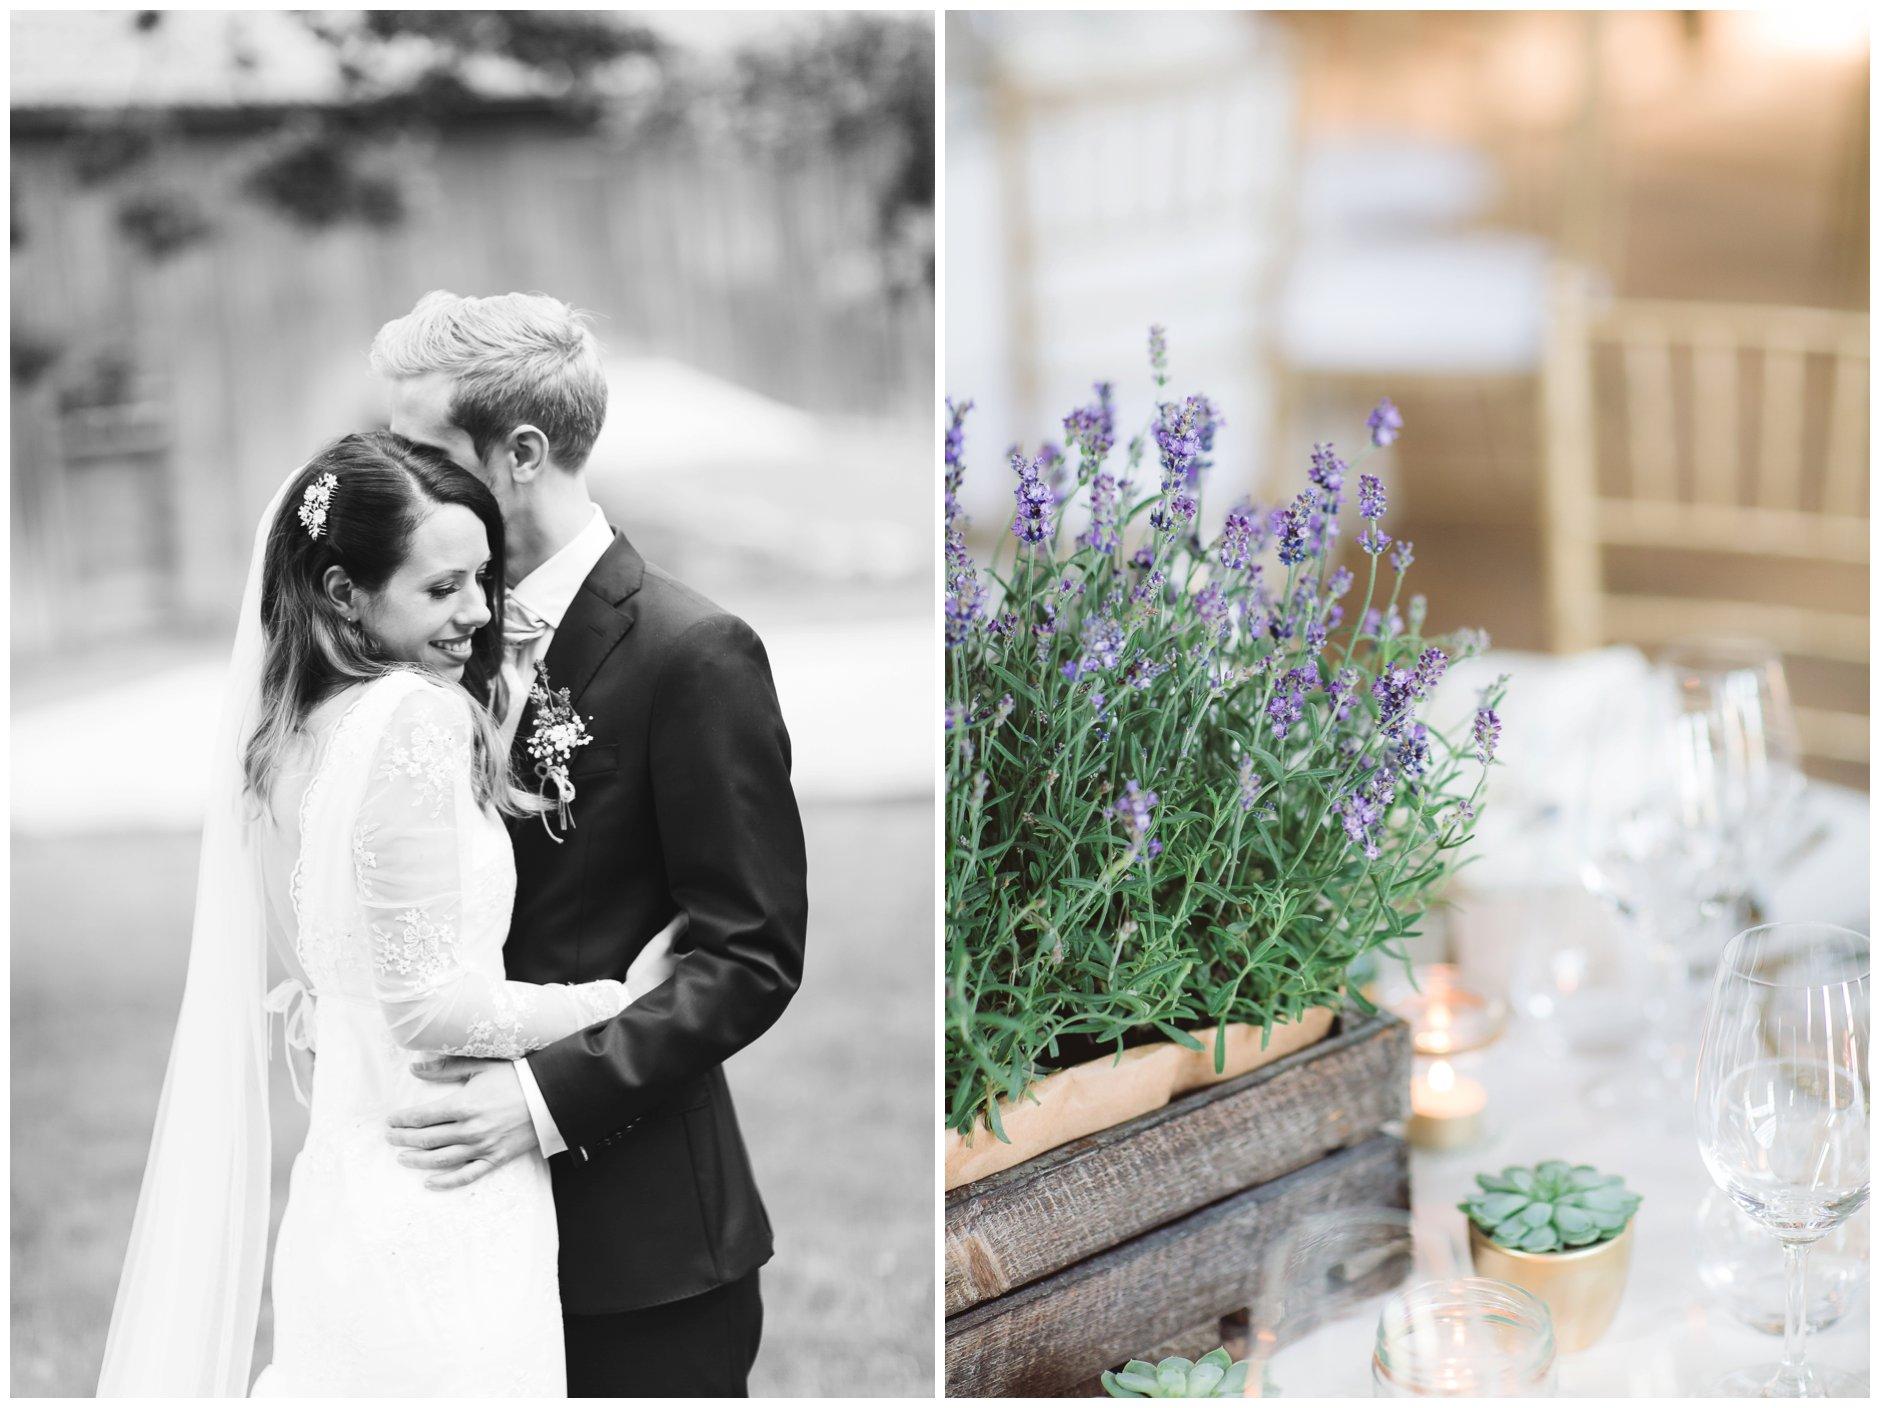 Priser for bryllupsfoto